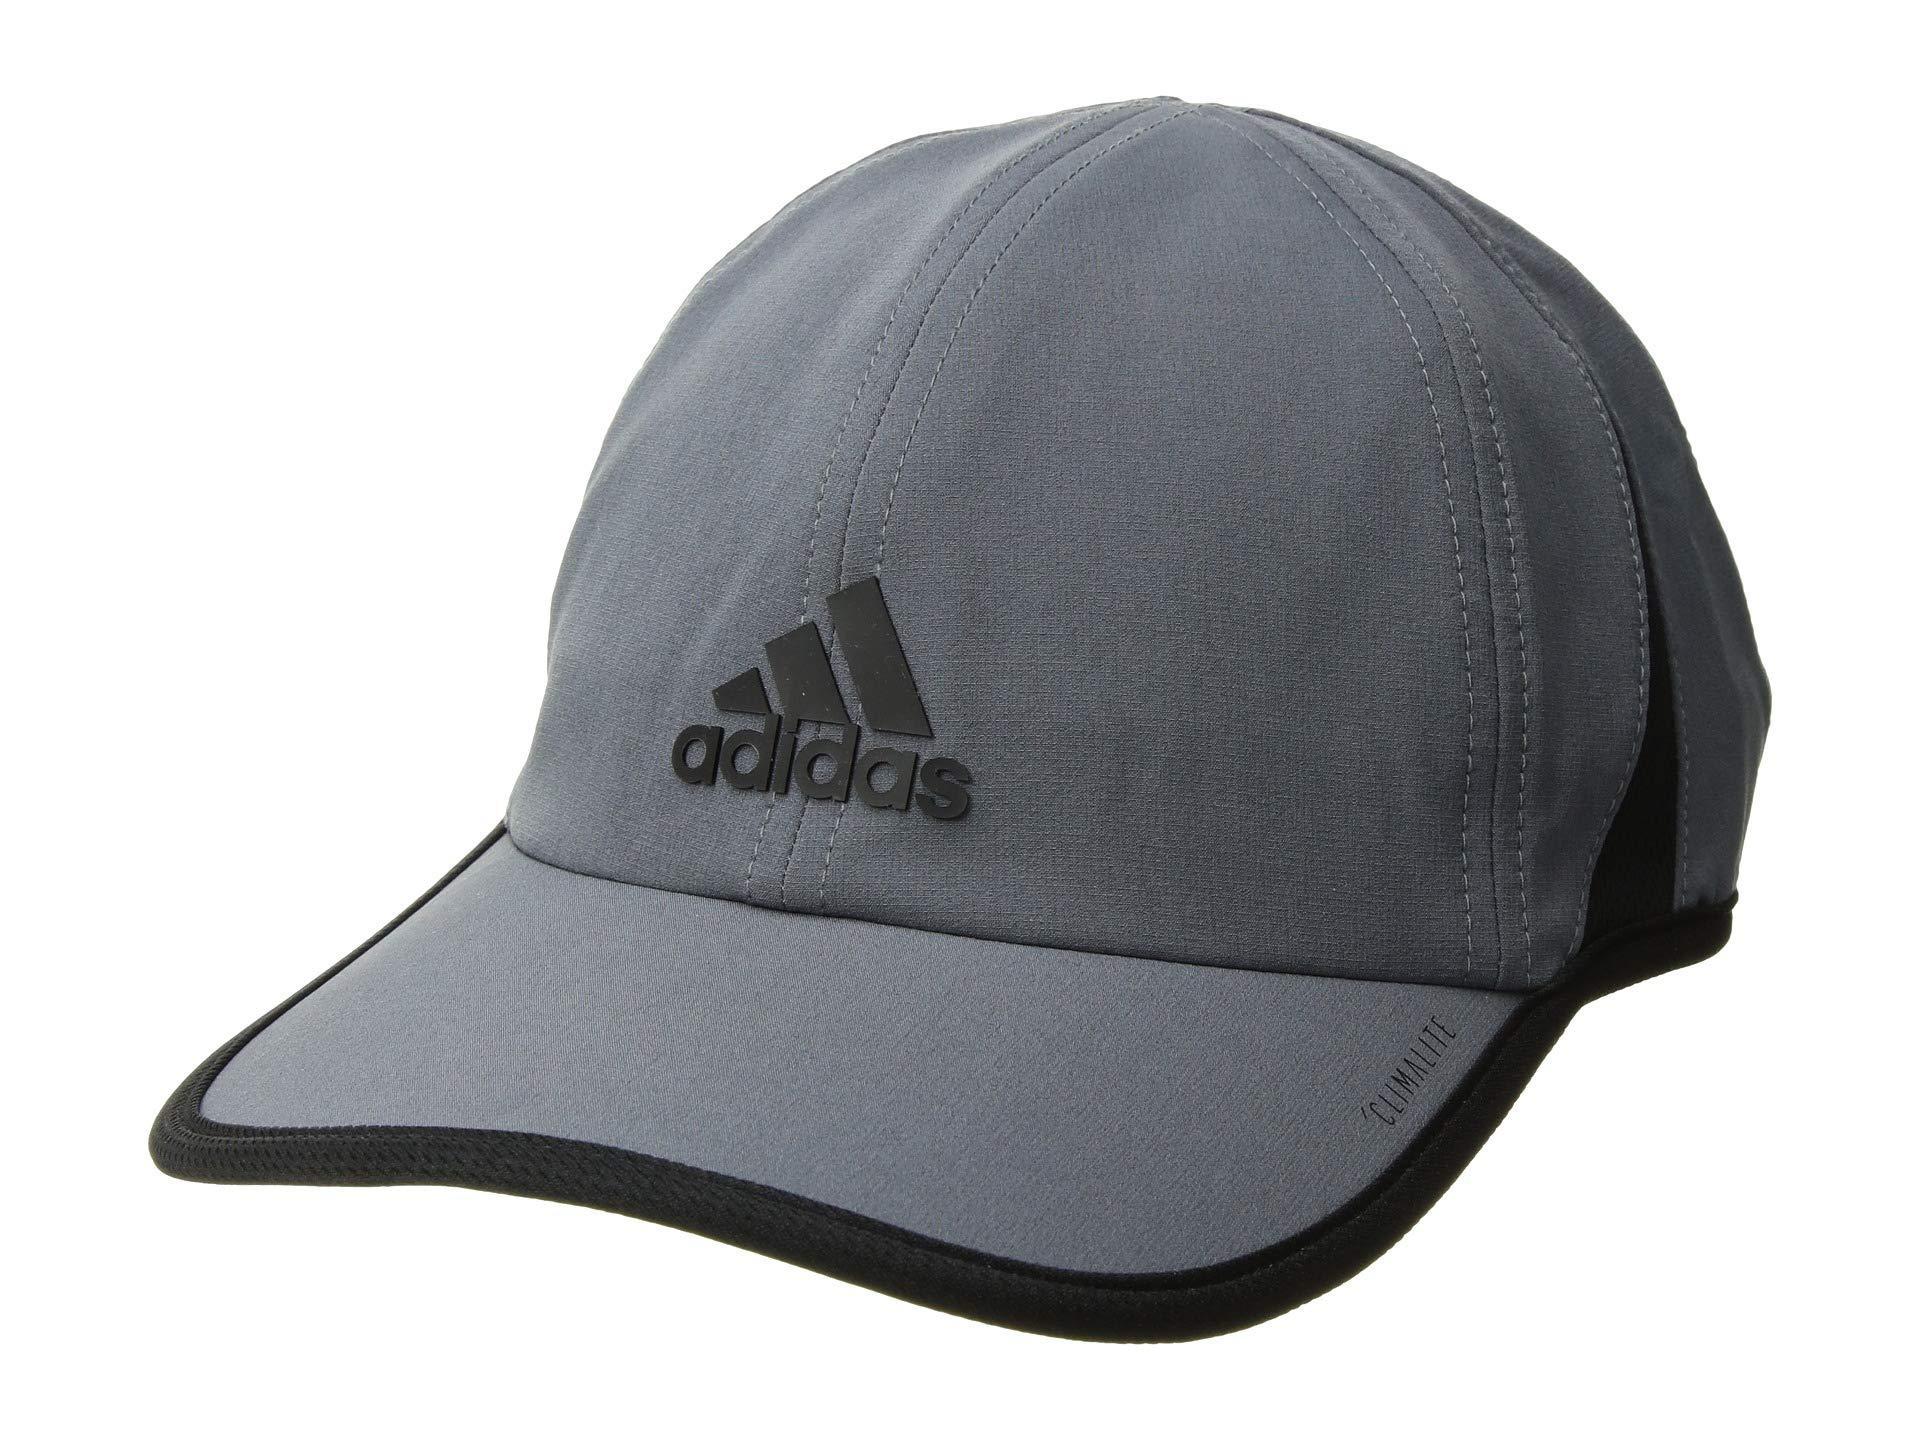 c5a1b7deadc Adidas - Superlite Cap (black white) Caps for Men - Lyst. View fullscreen